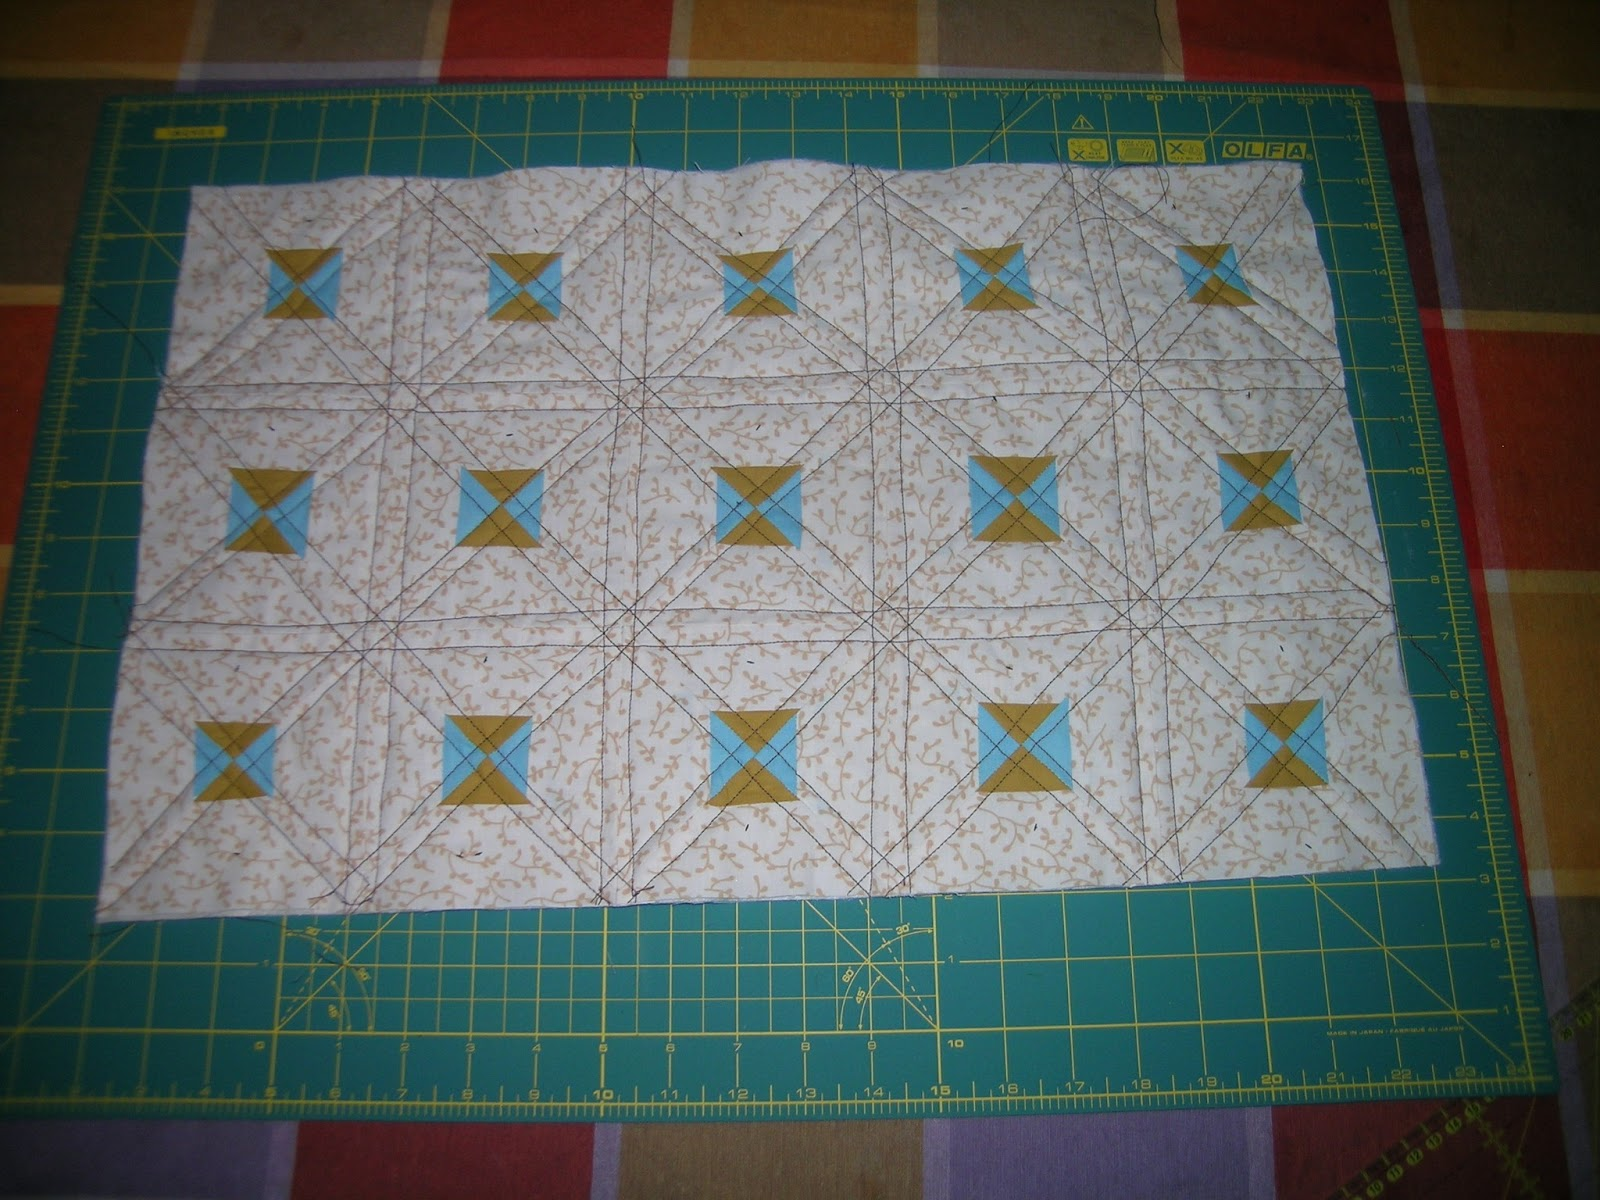 Labores artesanas el tapiz misterioso de authentic - Almazuelas patrones gratis ...